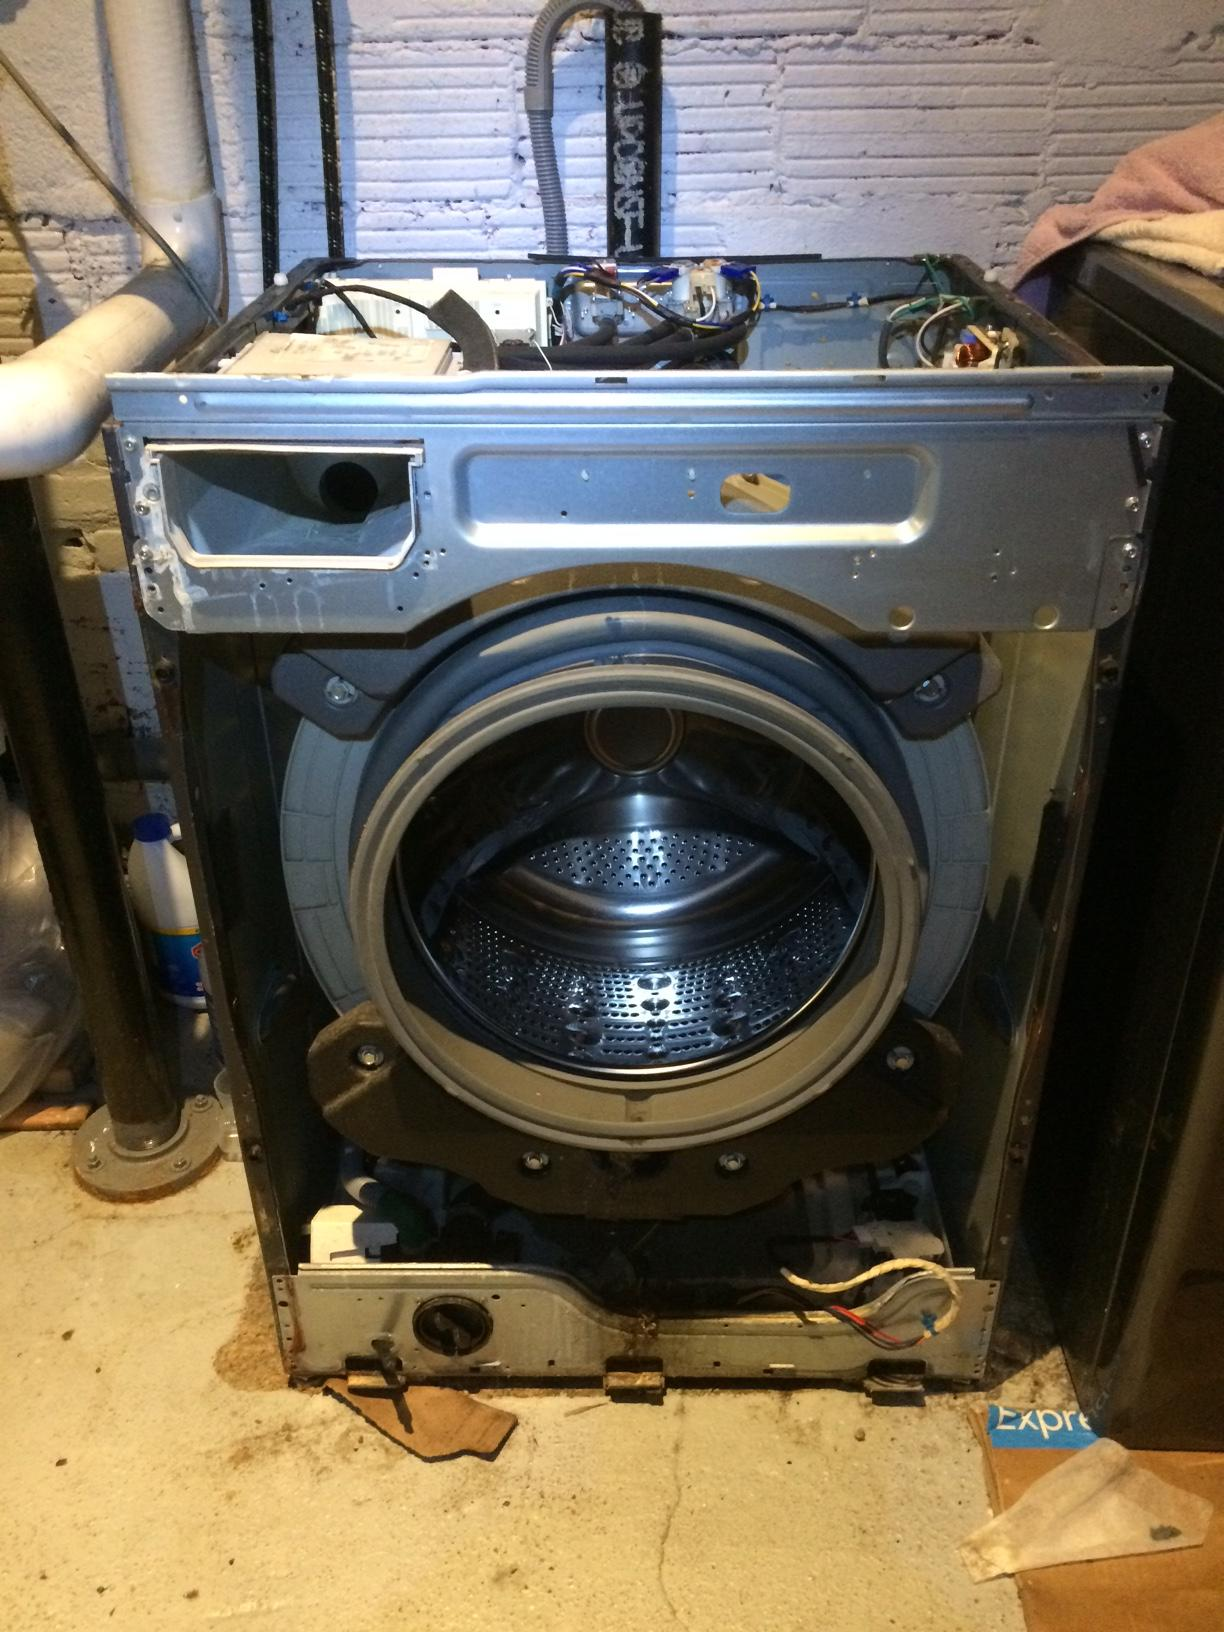 Global Solutions Appliance Repair